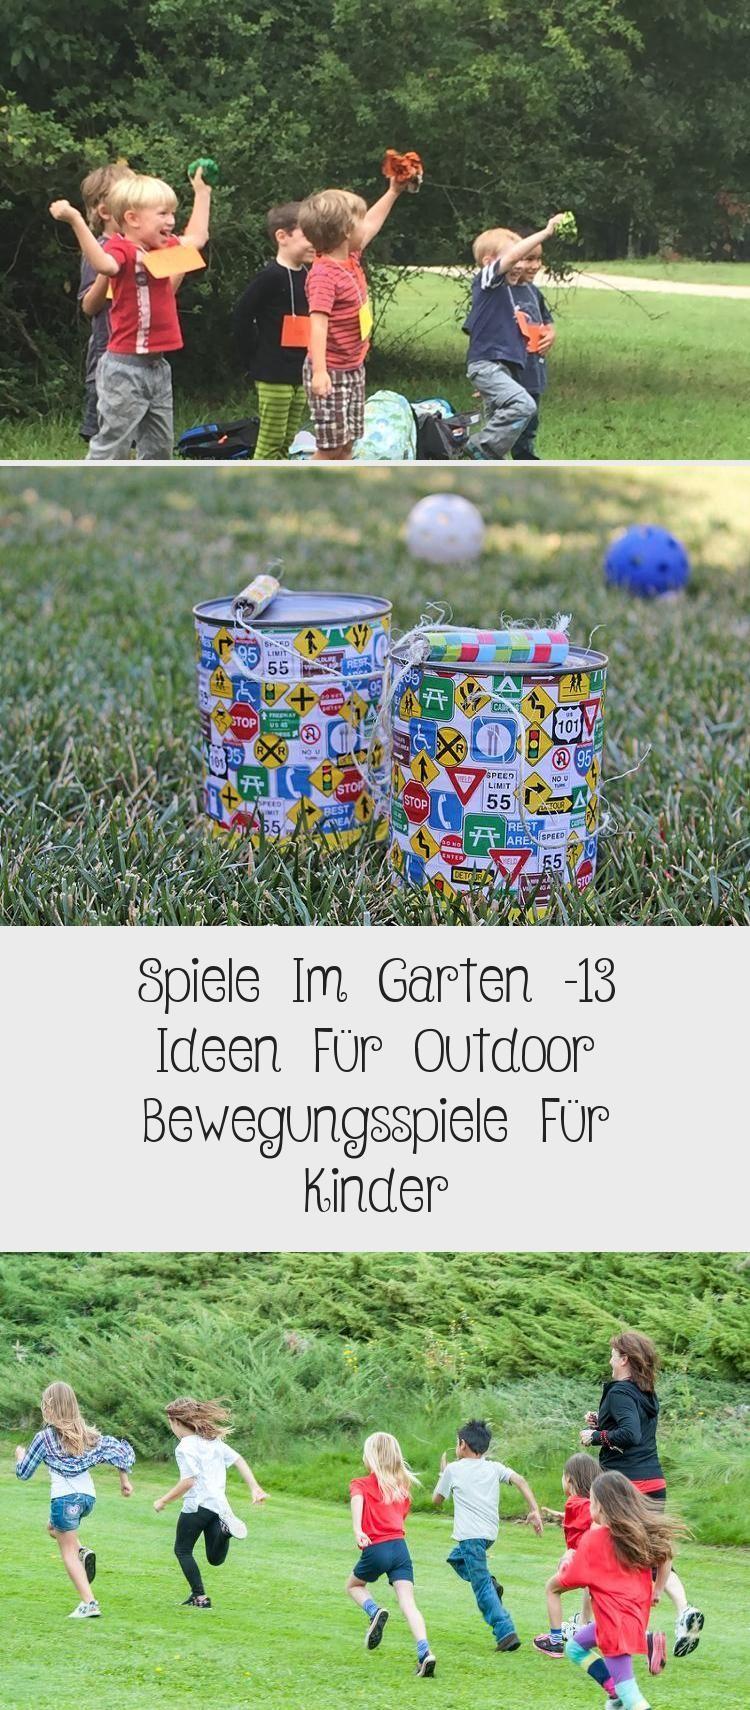 Spiele Im Garten 13 Ideen Fur Outdoor Bewegungssp In 2020 Workout Games Outdoor Workouts Kids Sandbox